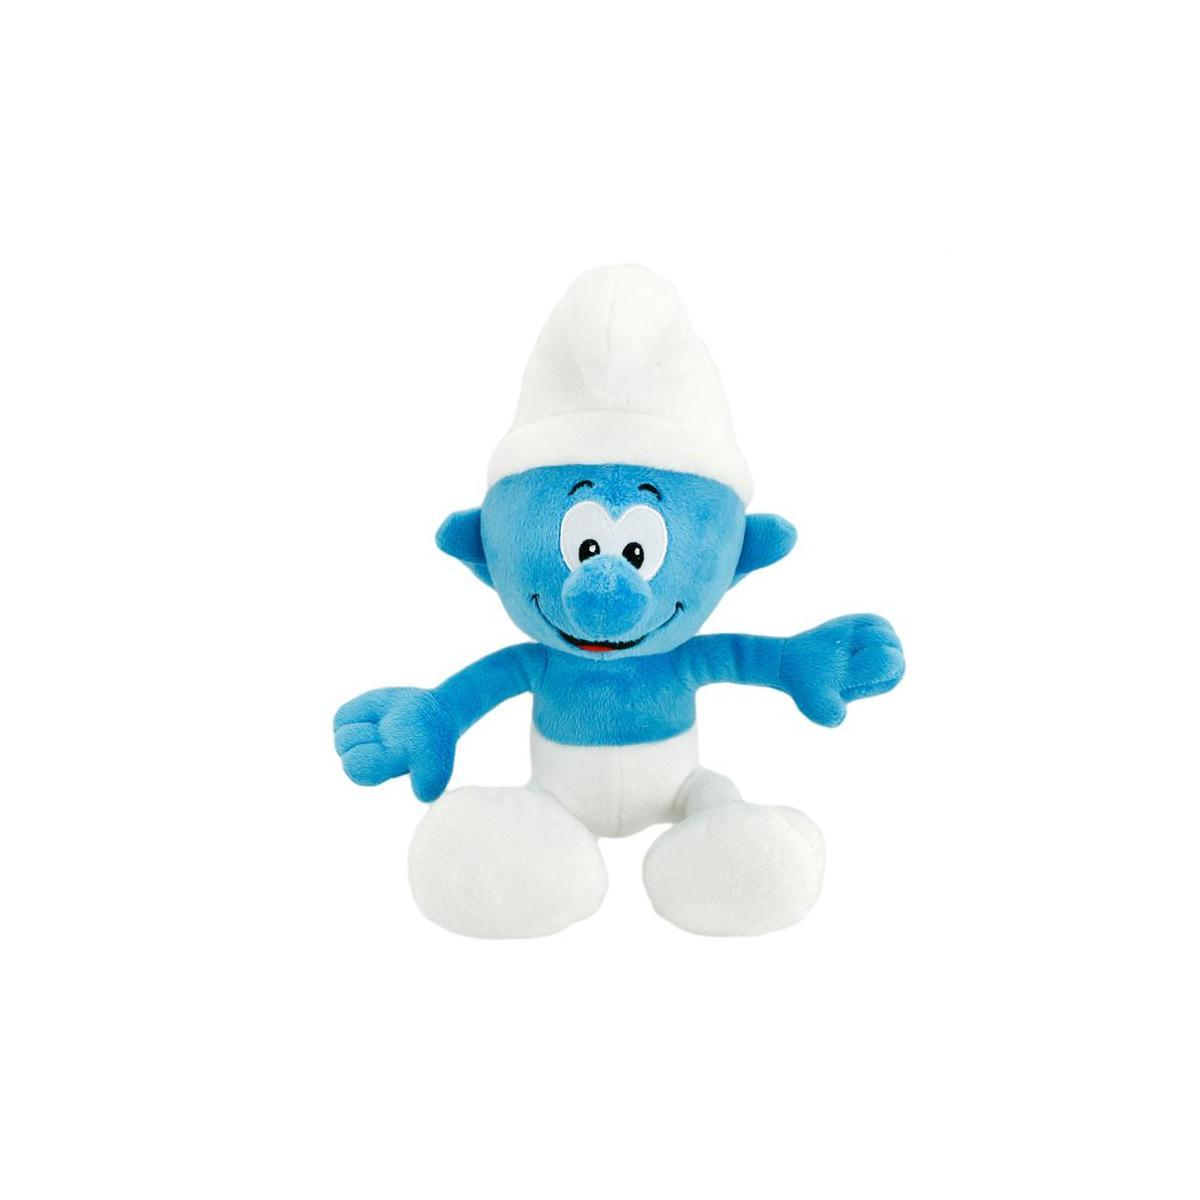 Neco Toys Sirinler Sirin Pelus Oyuncak 30 Cm